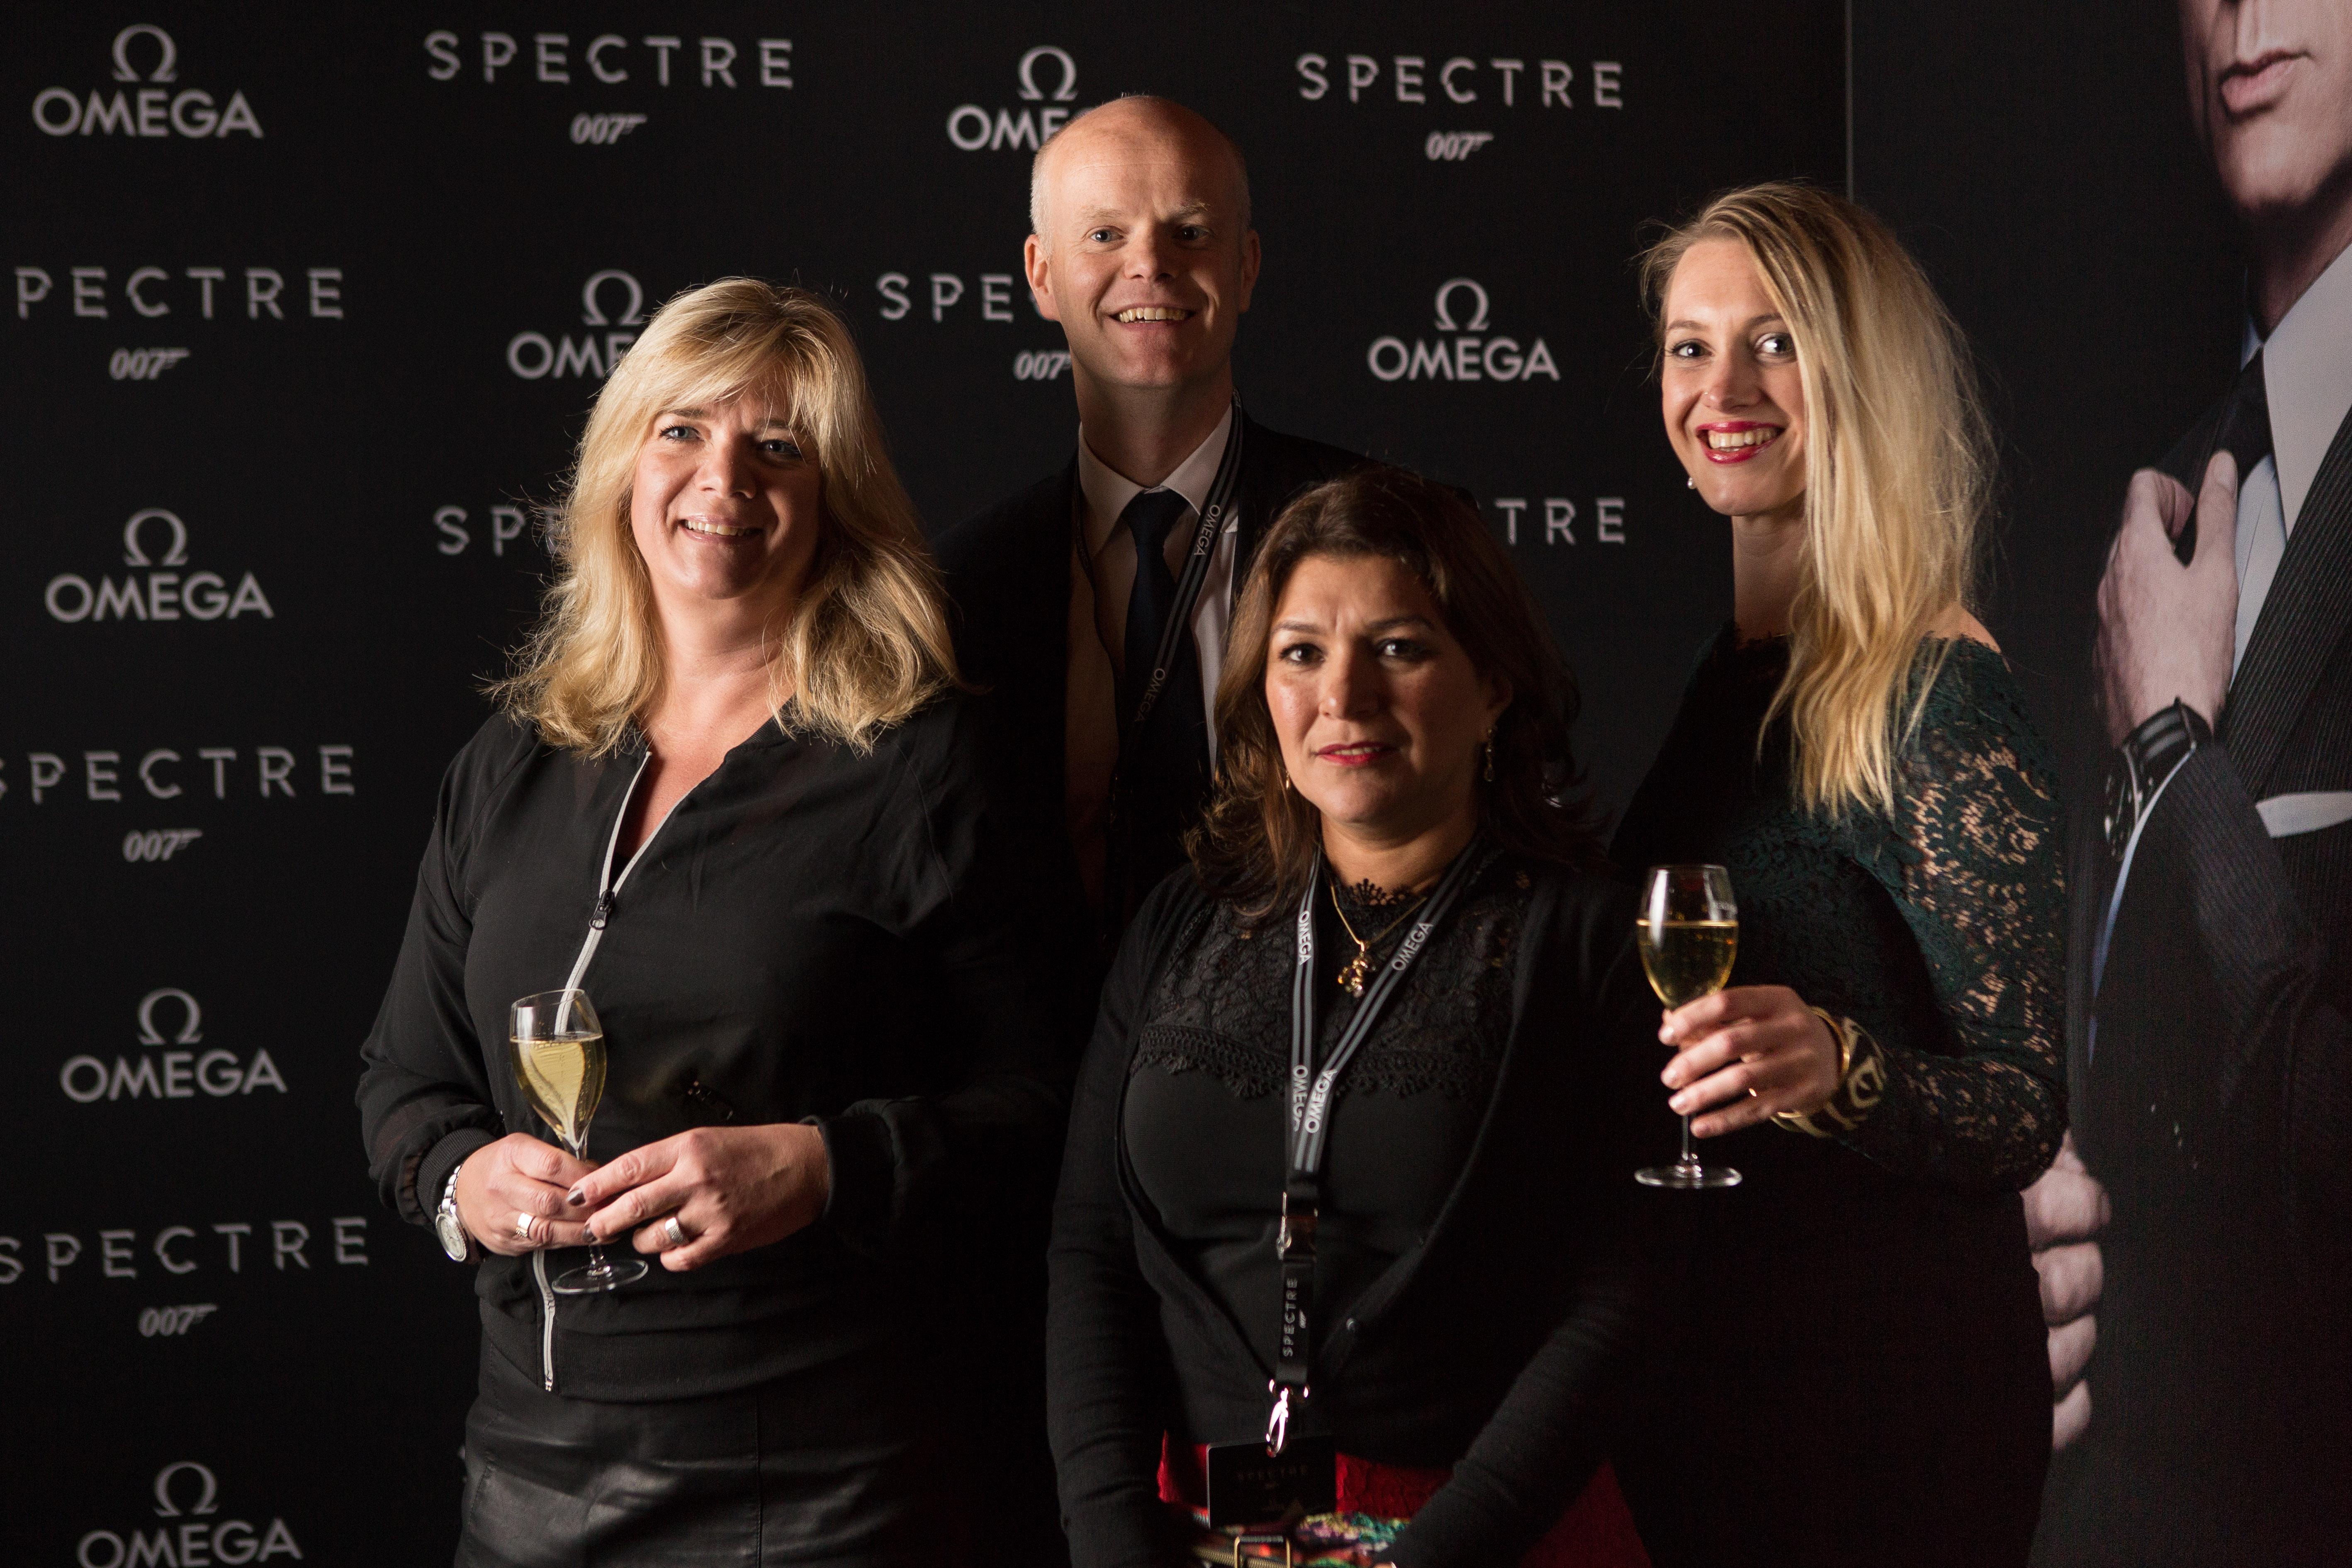 spectre-omega wall-13